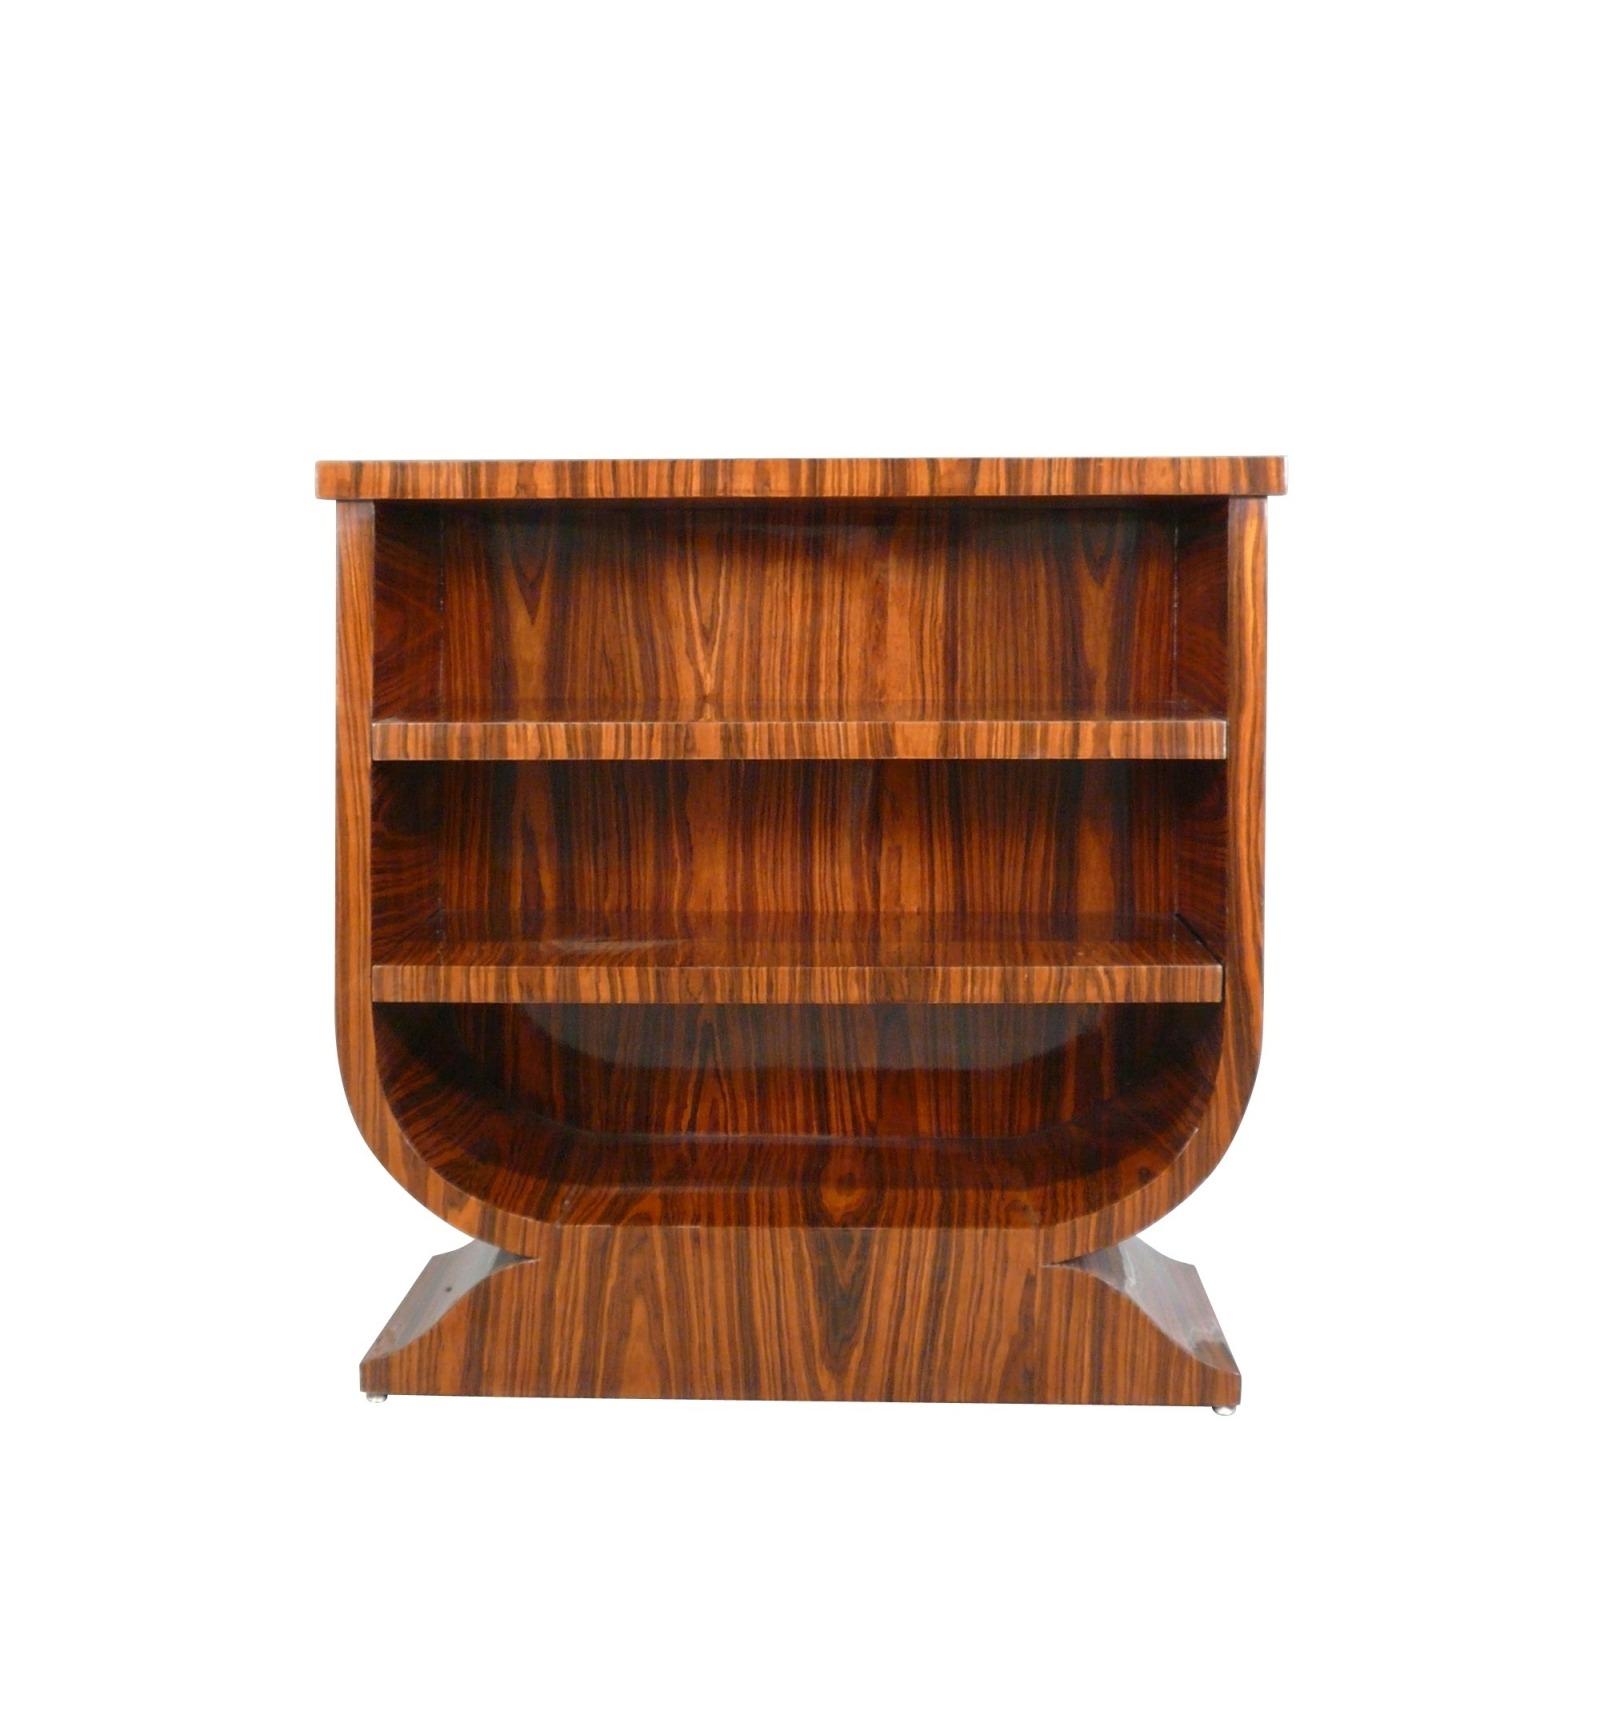 meuble art d co tv. Black Bedroom Furniture Sets. Home Design Ideas